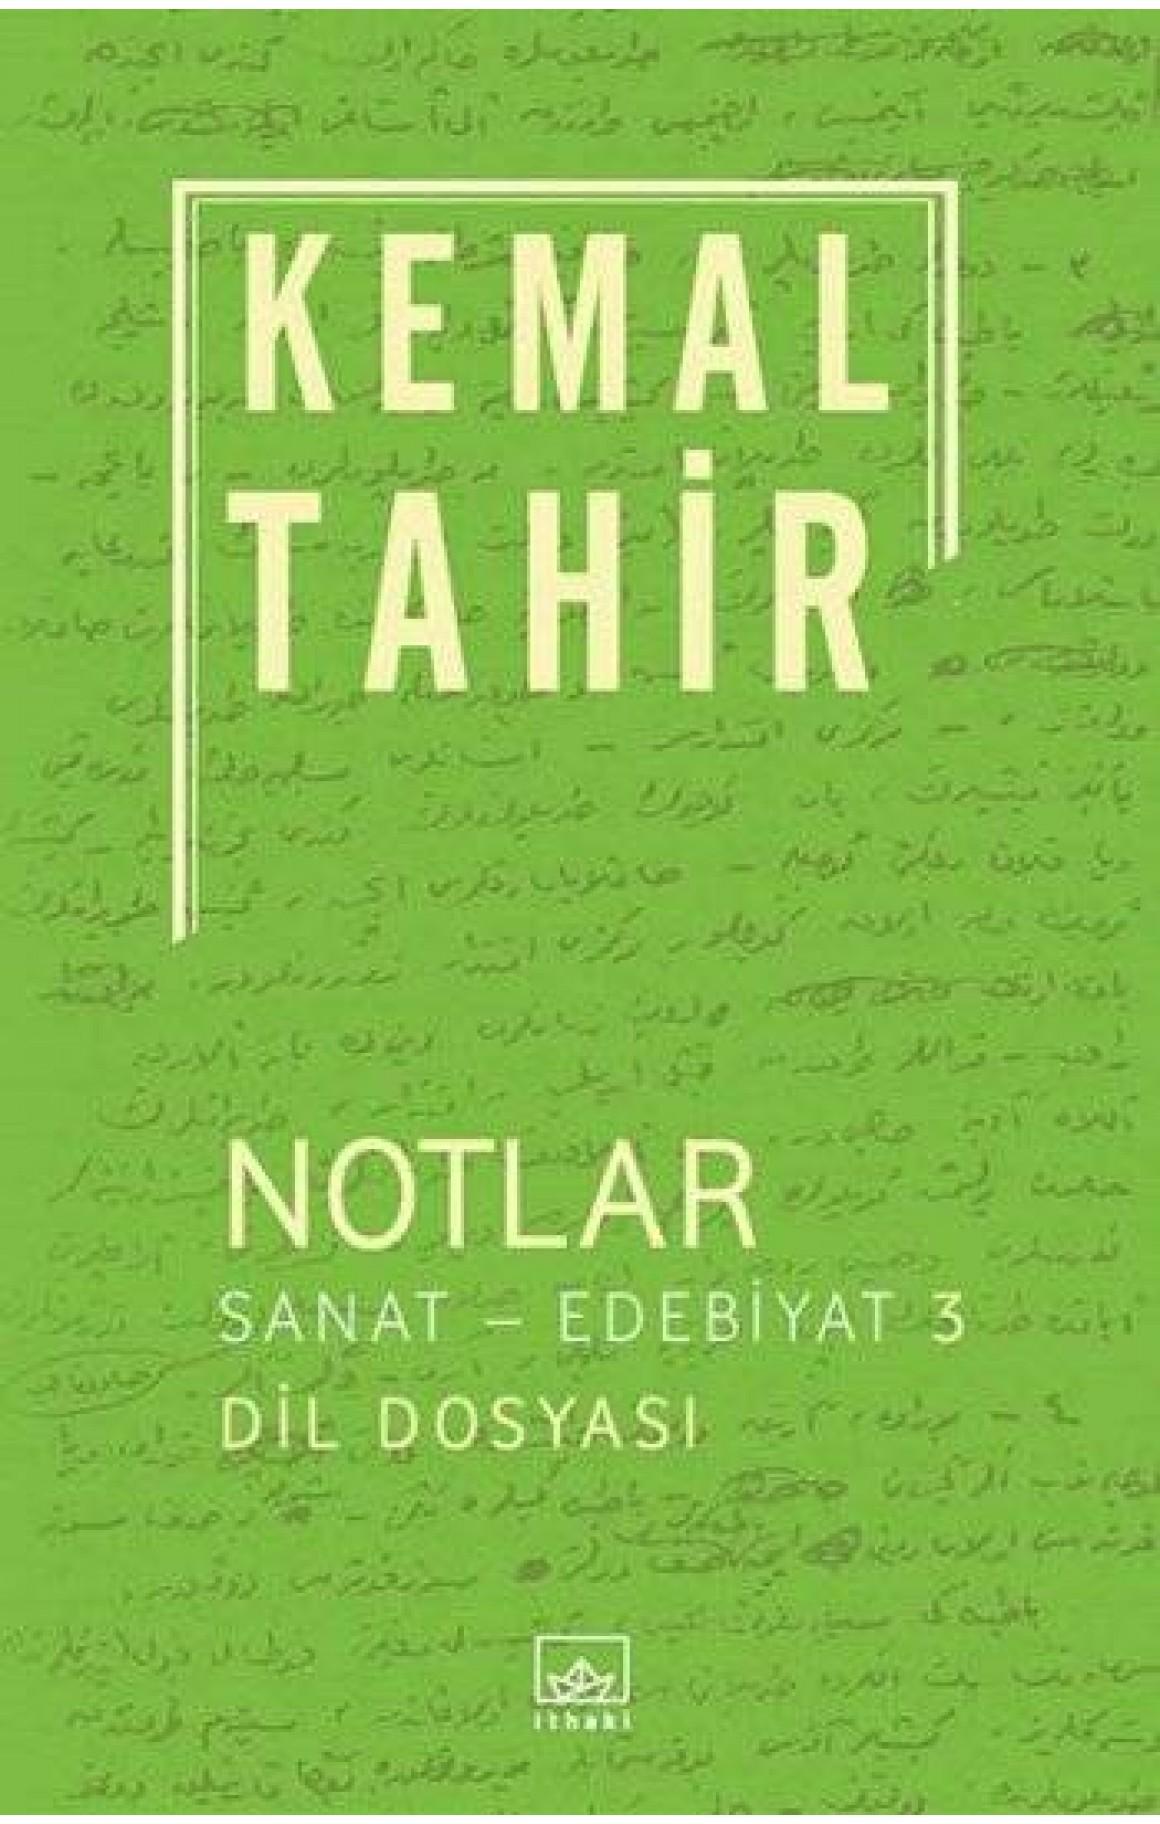 Notlar - Sanat - Edebiyat 3